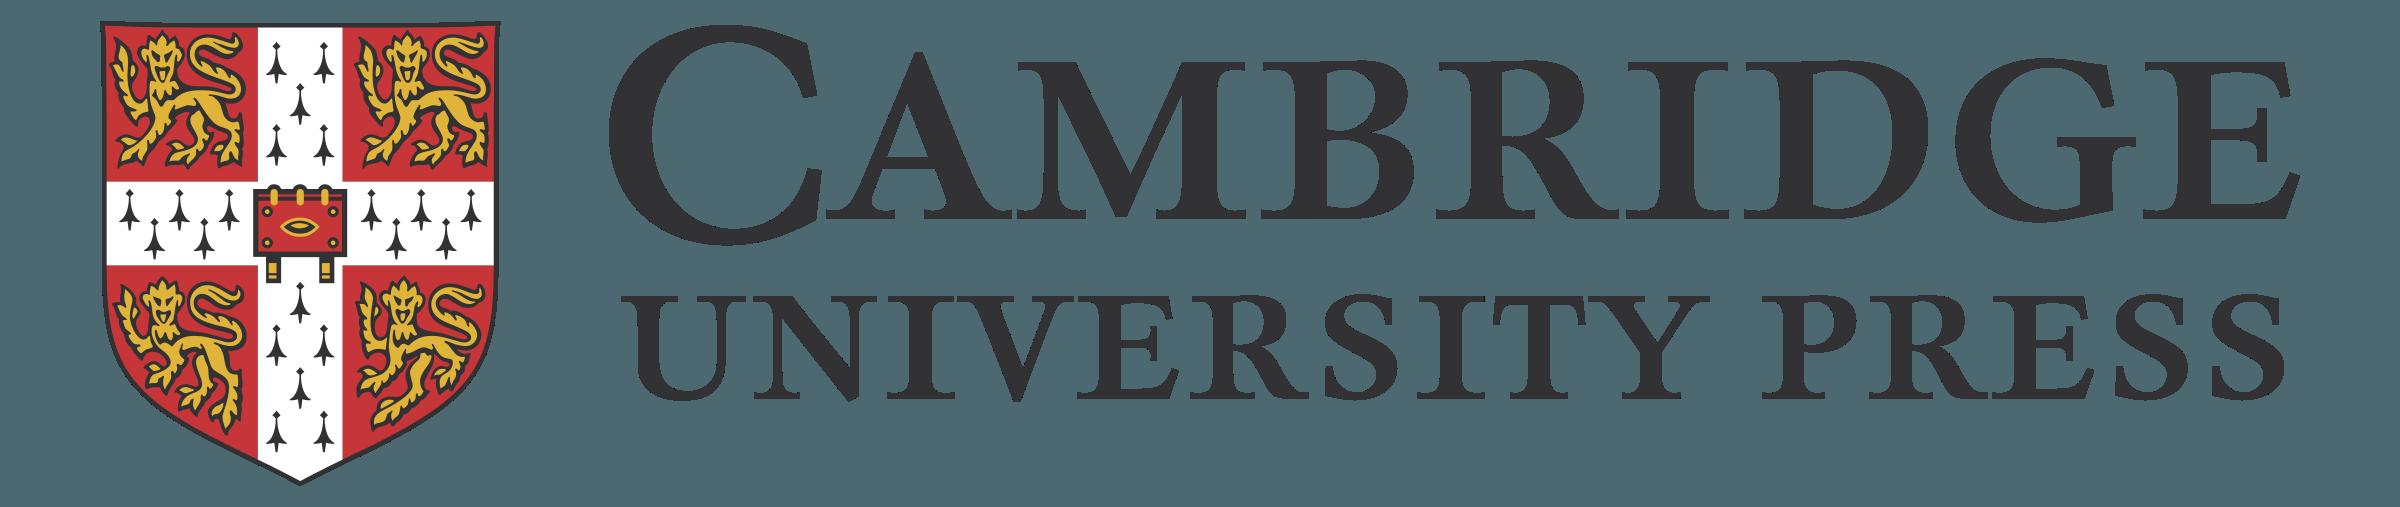 Cambridge Logo PNG Transparent & SVG Vector.